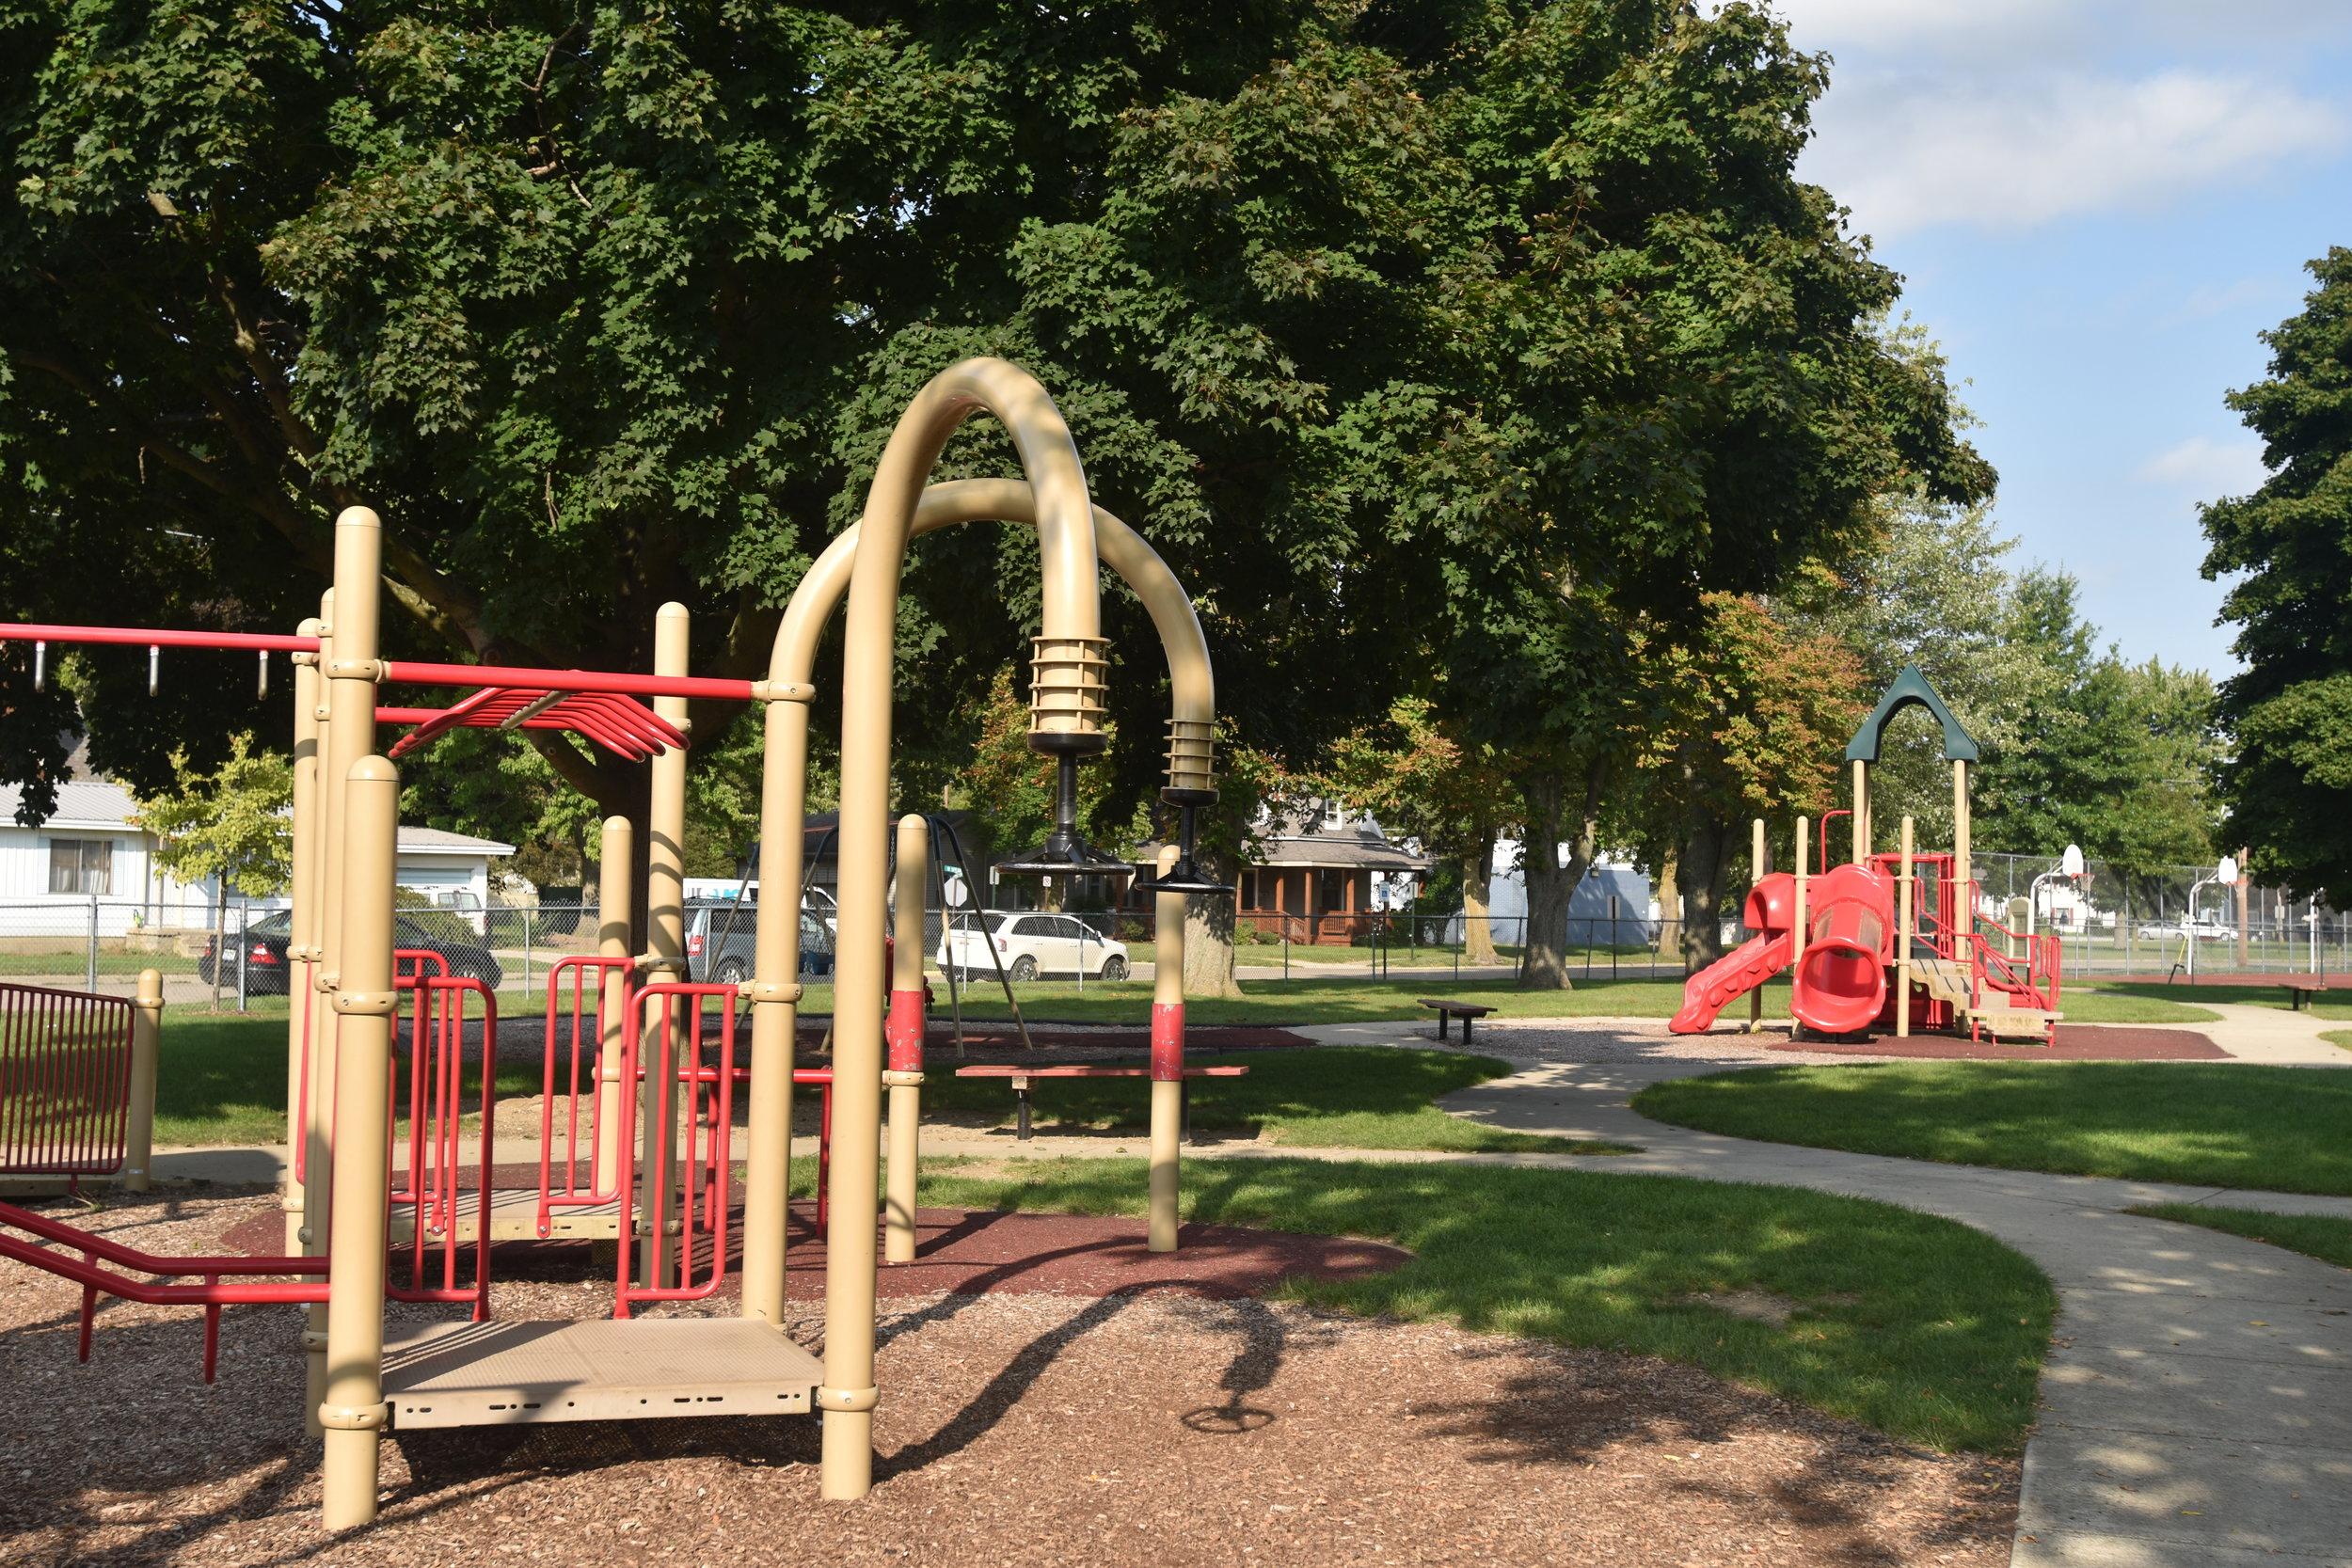 Playground City Park